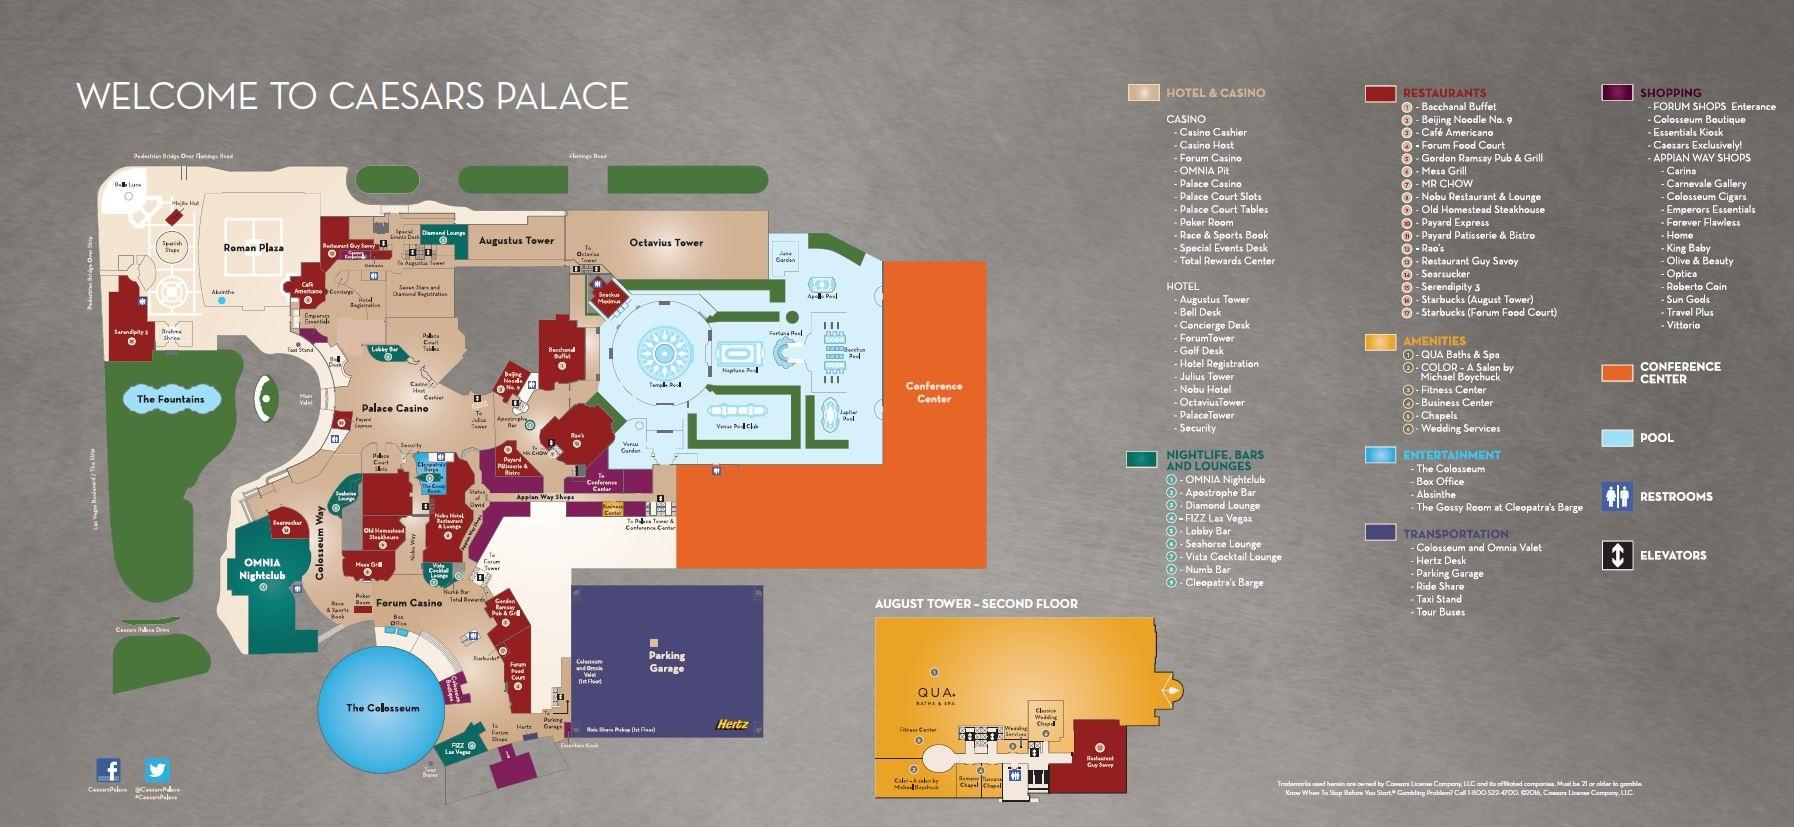 Caesars Palace Meeting Room Floor Plan | Taraba Home Review on